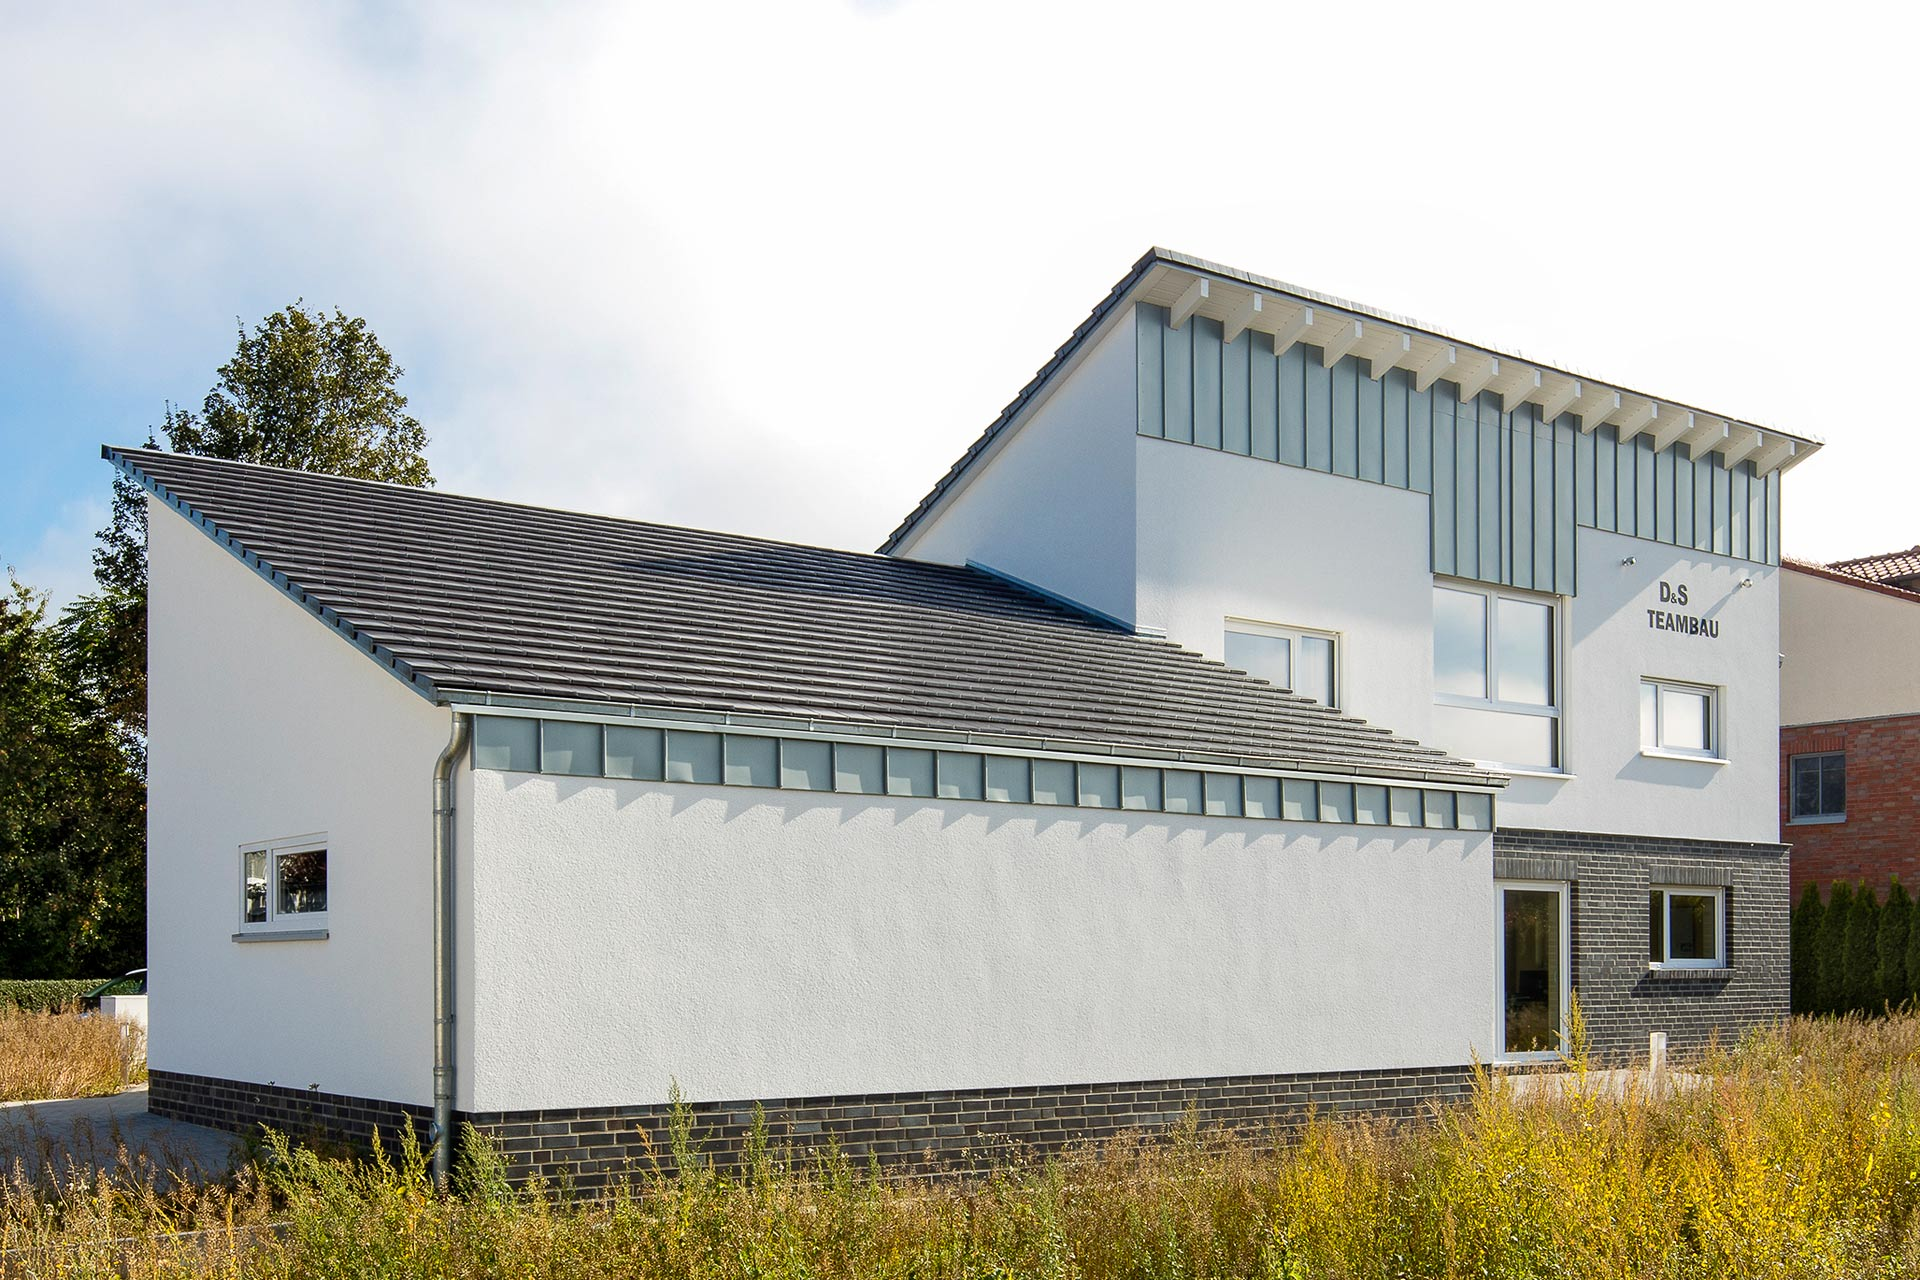 D&S Teambau - Musterhaus